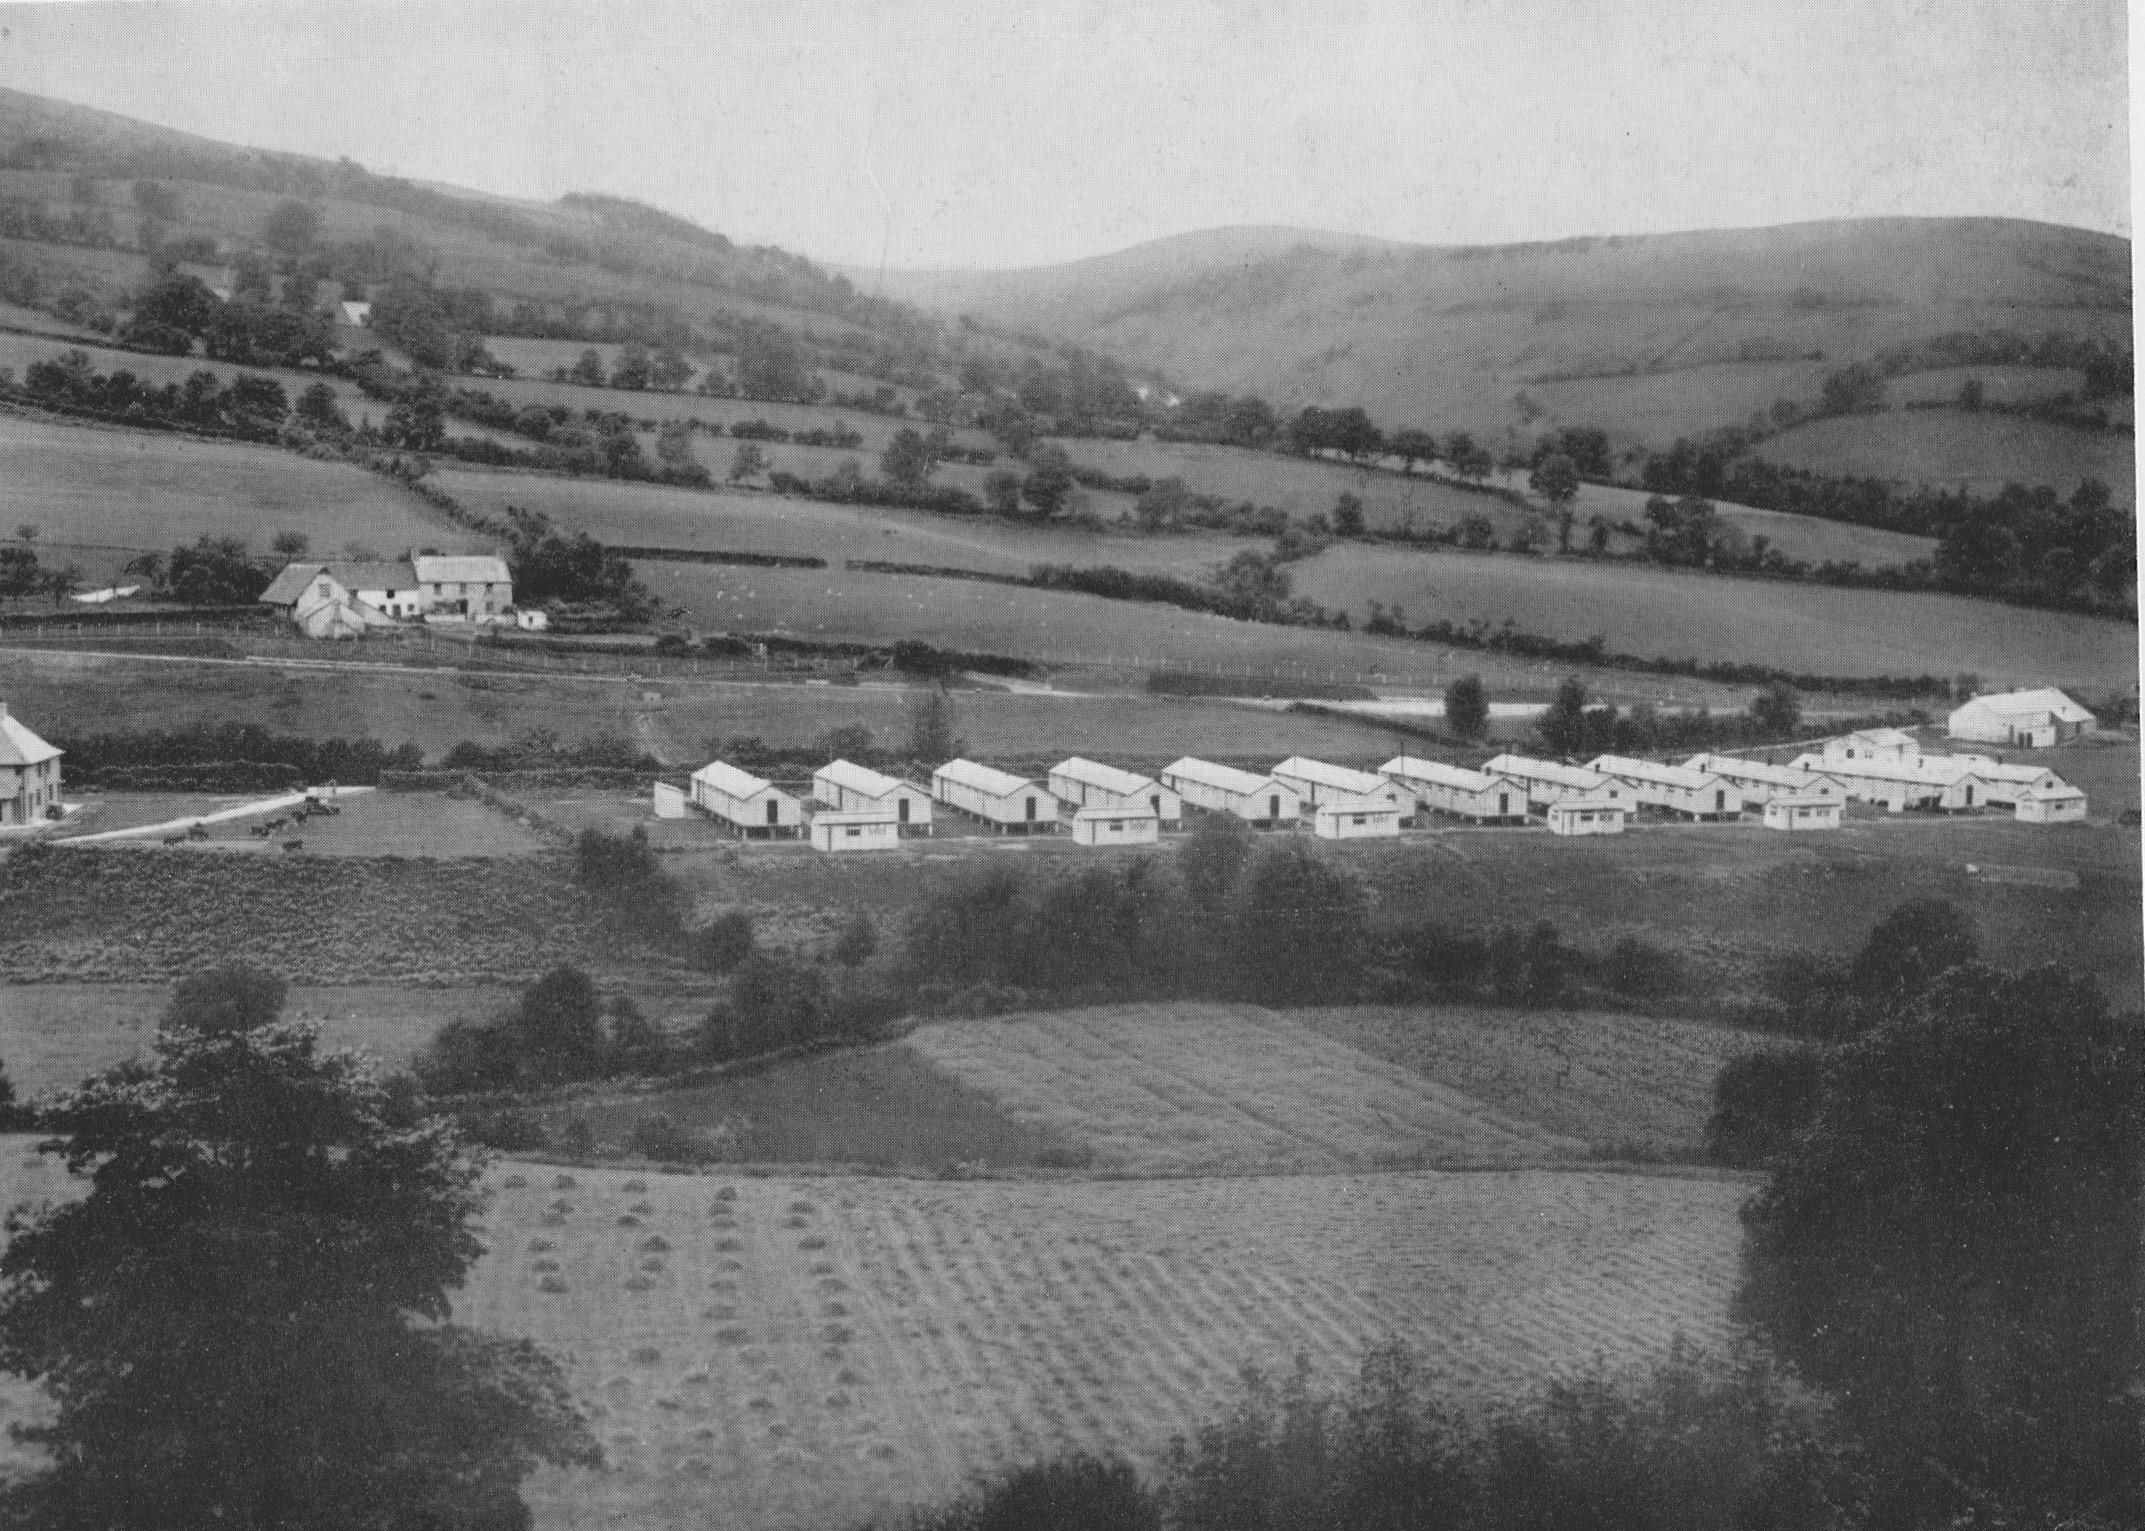 Reservoir workforce huts 1931